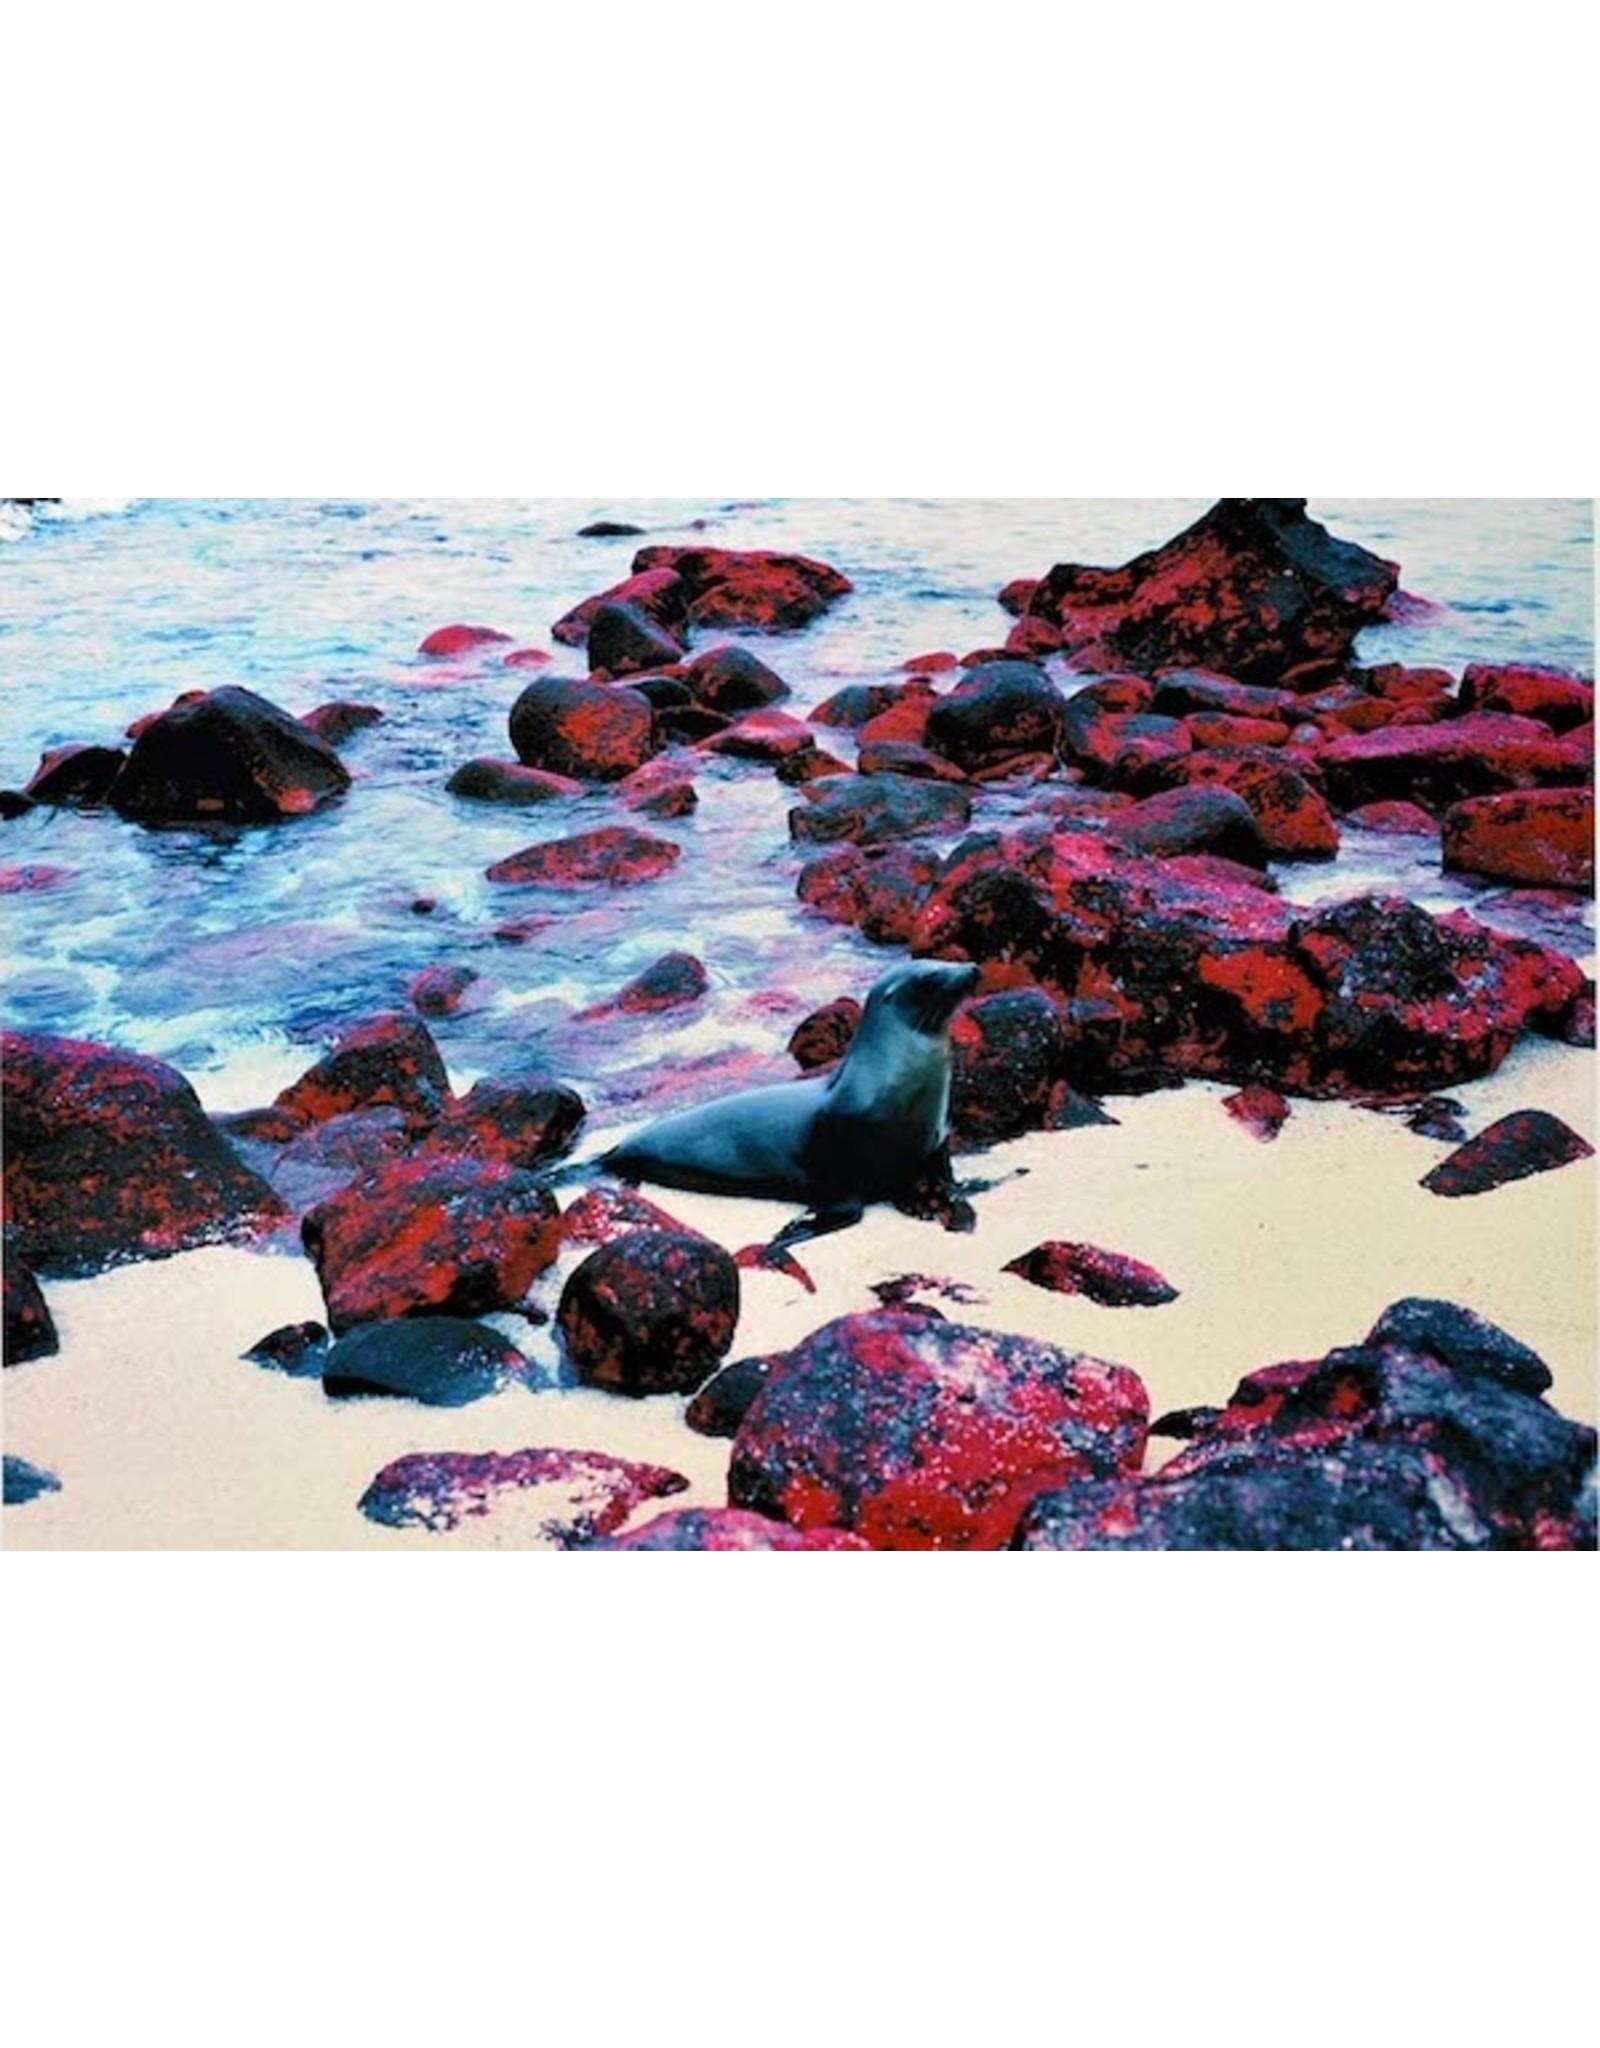 Gordon Trewinnard GordonTrewinnard, Seal, Galapagos Islands